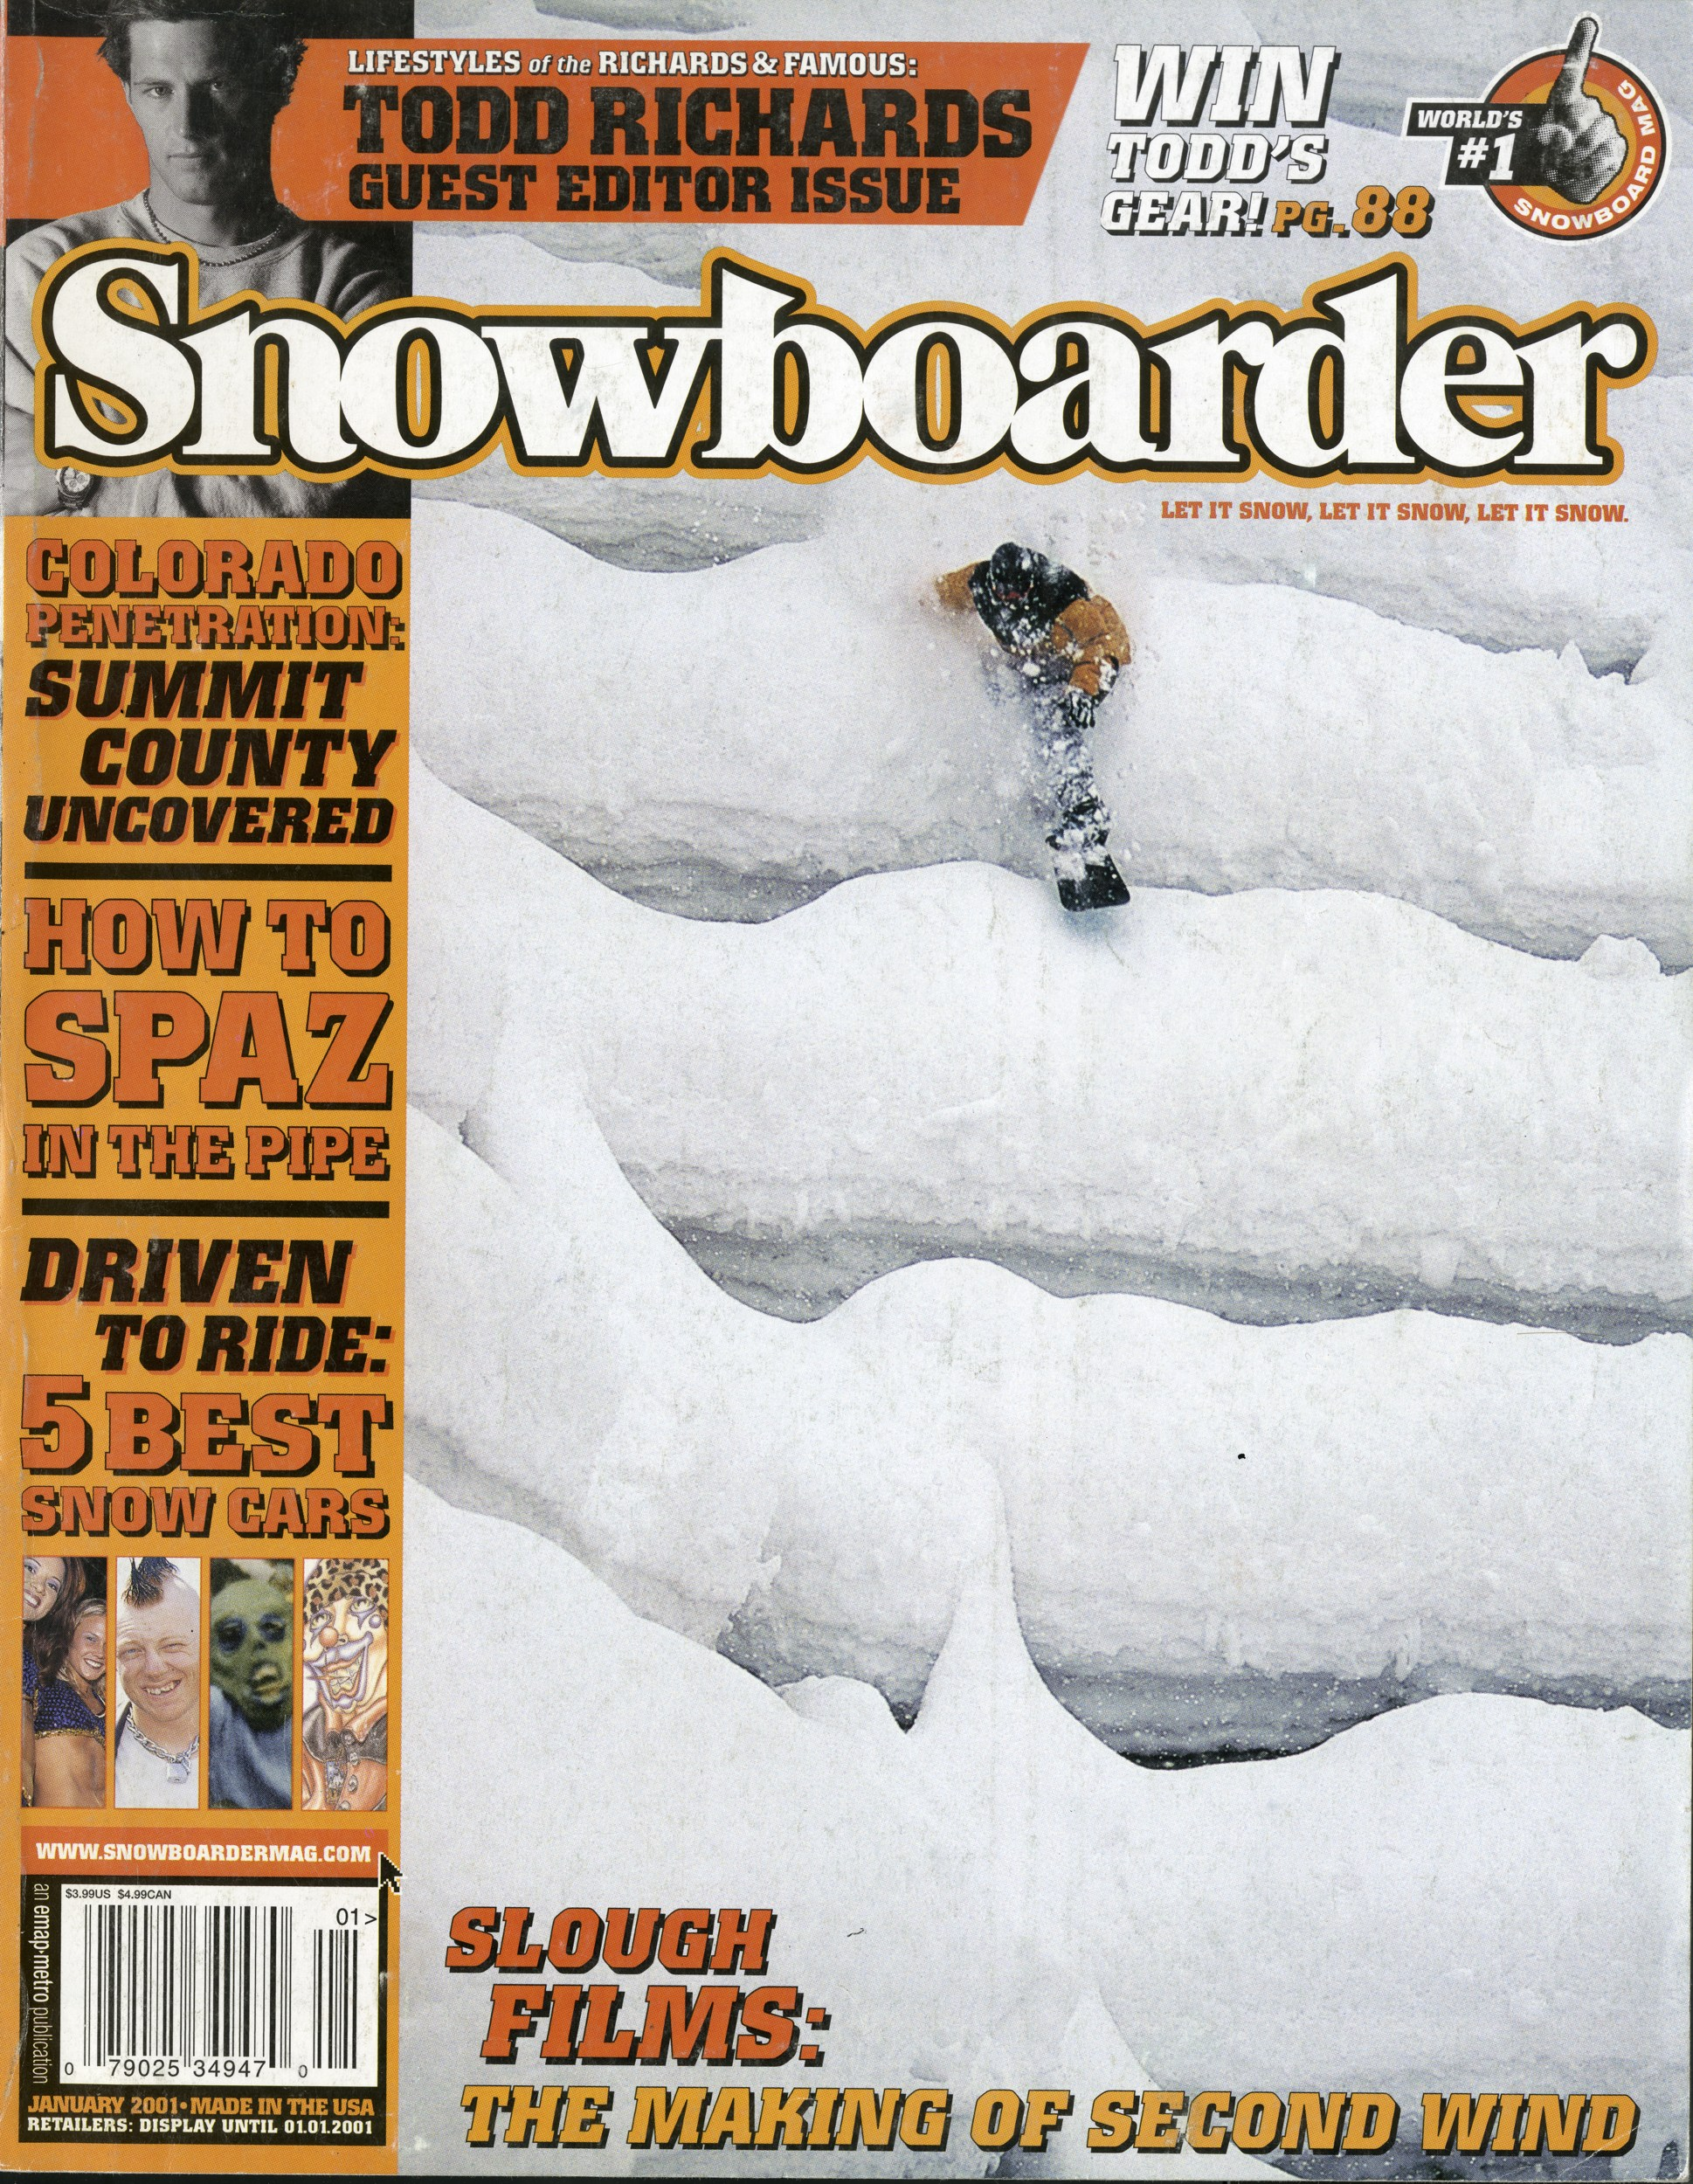 Keir Dillon interviewed by Trevor Andrew SNOWBOARDER Magazine